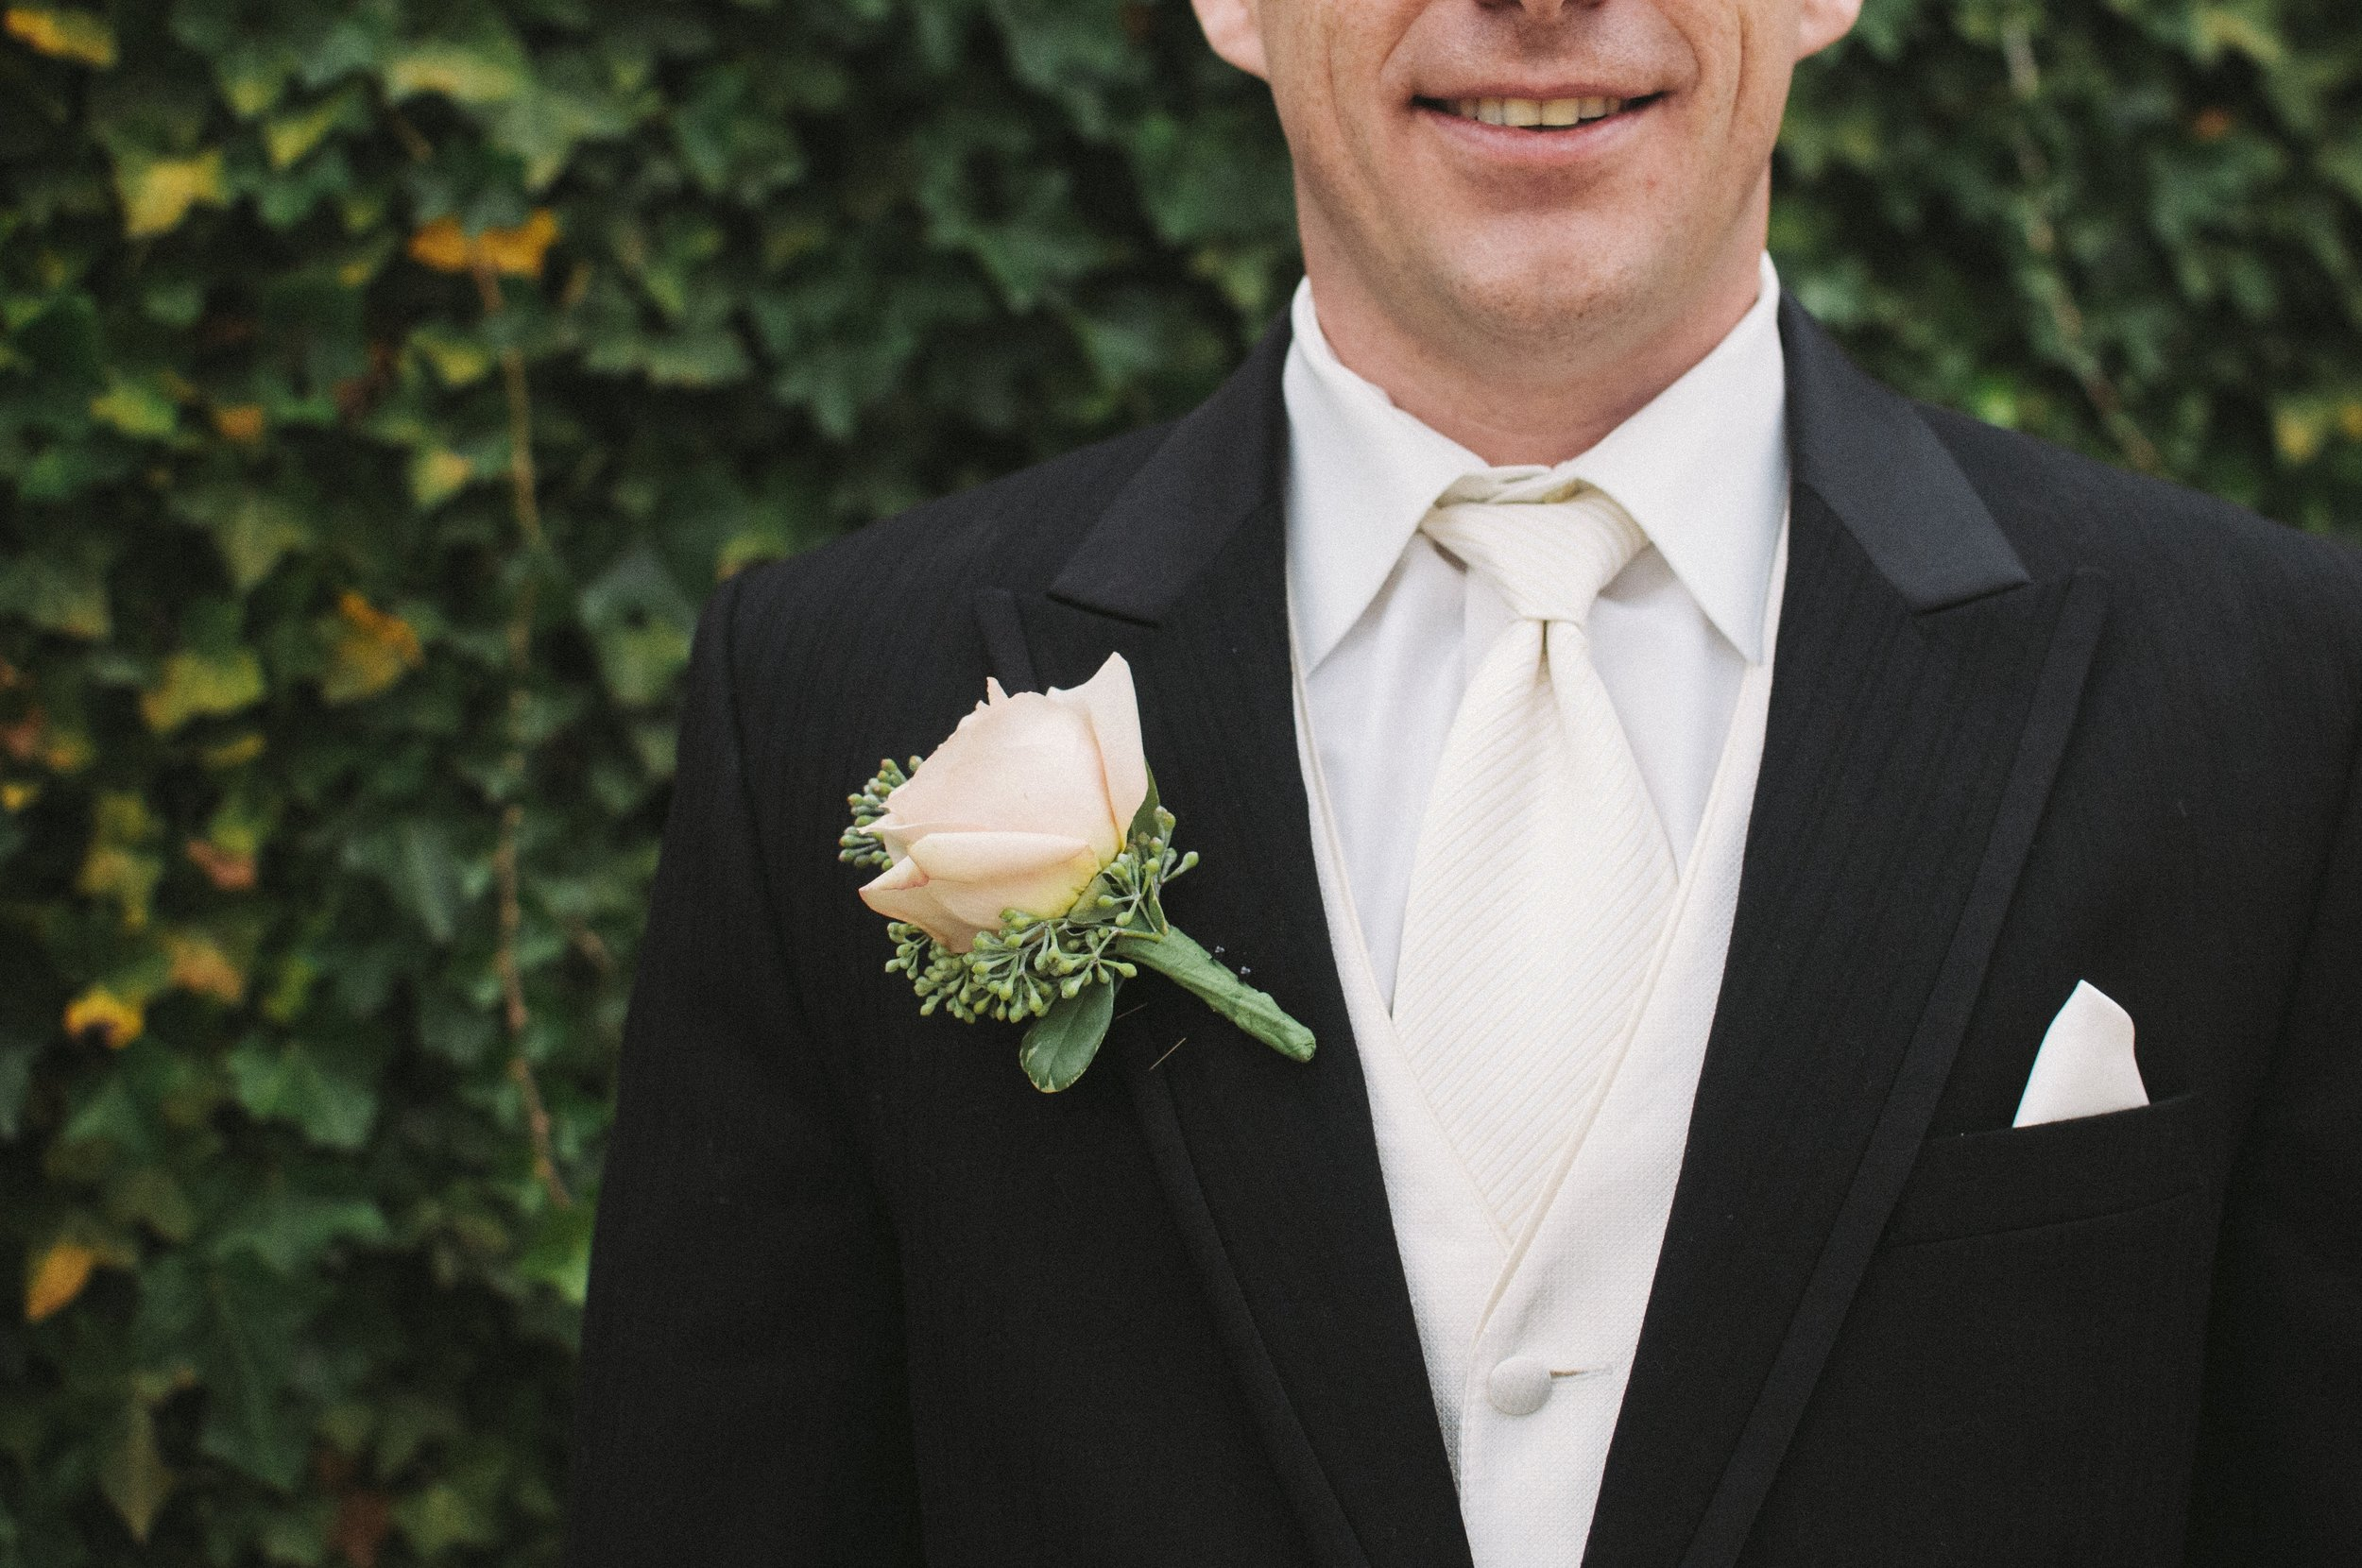 flower-formal-groom-177328.jpg